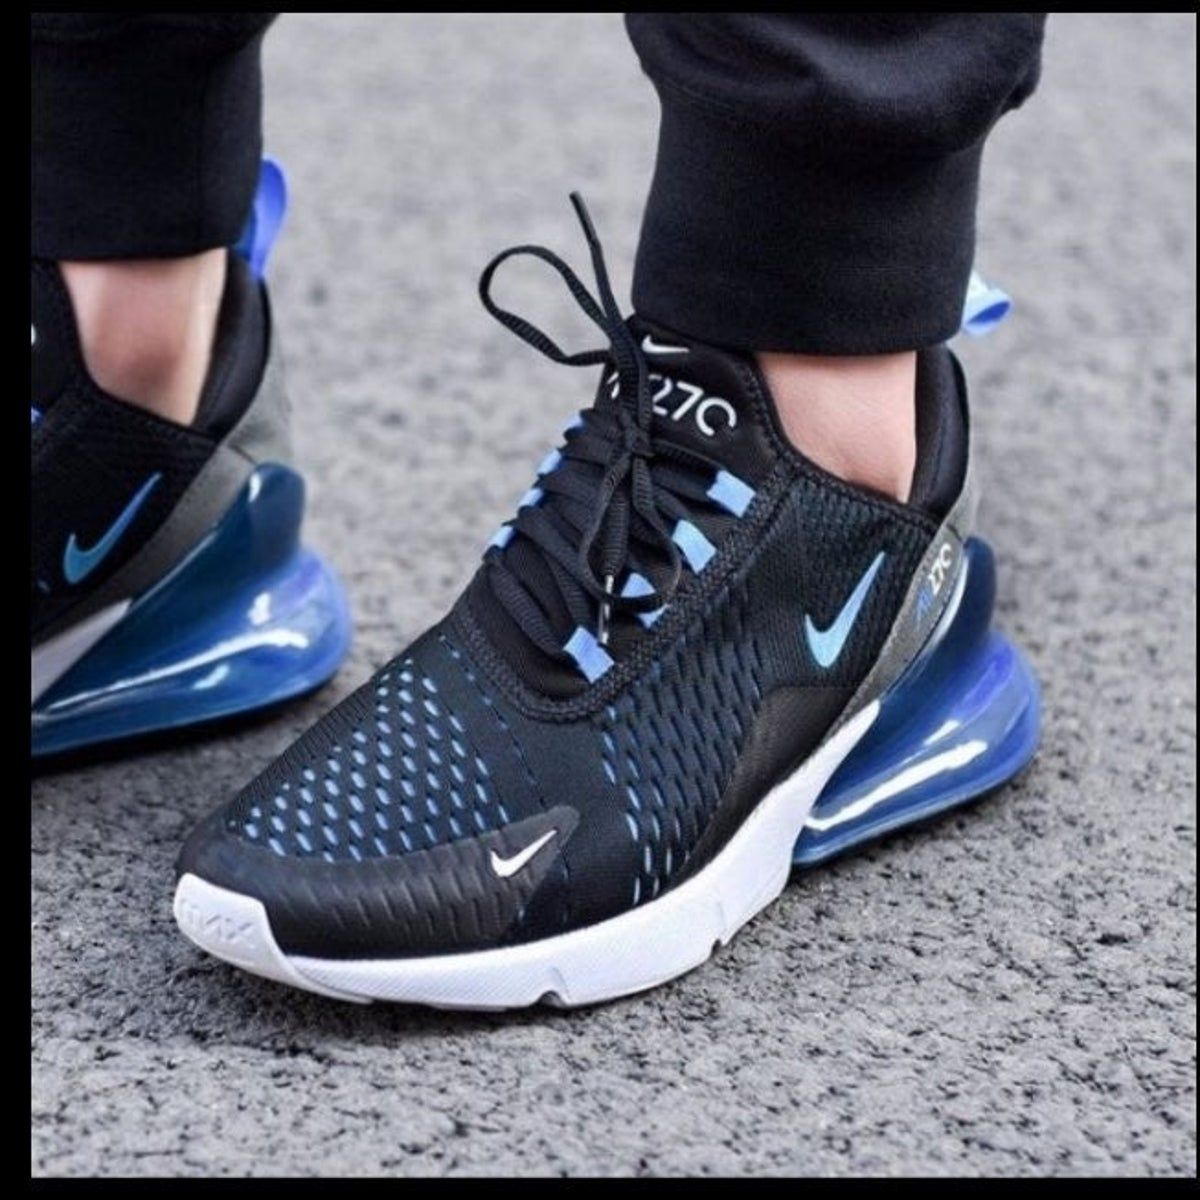 Nike Air Max 270 Liquid Metal Black